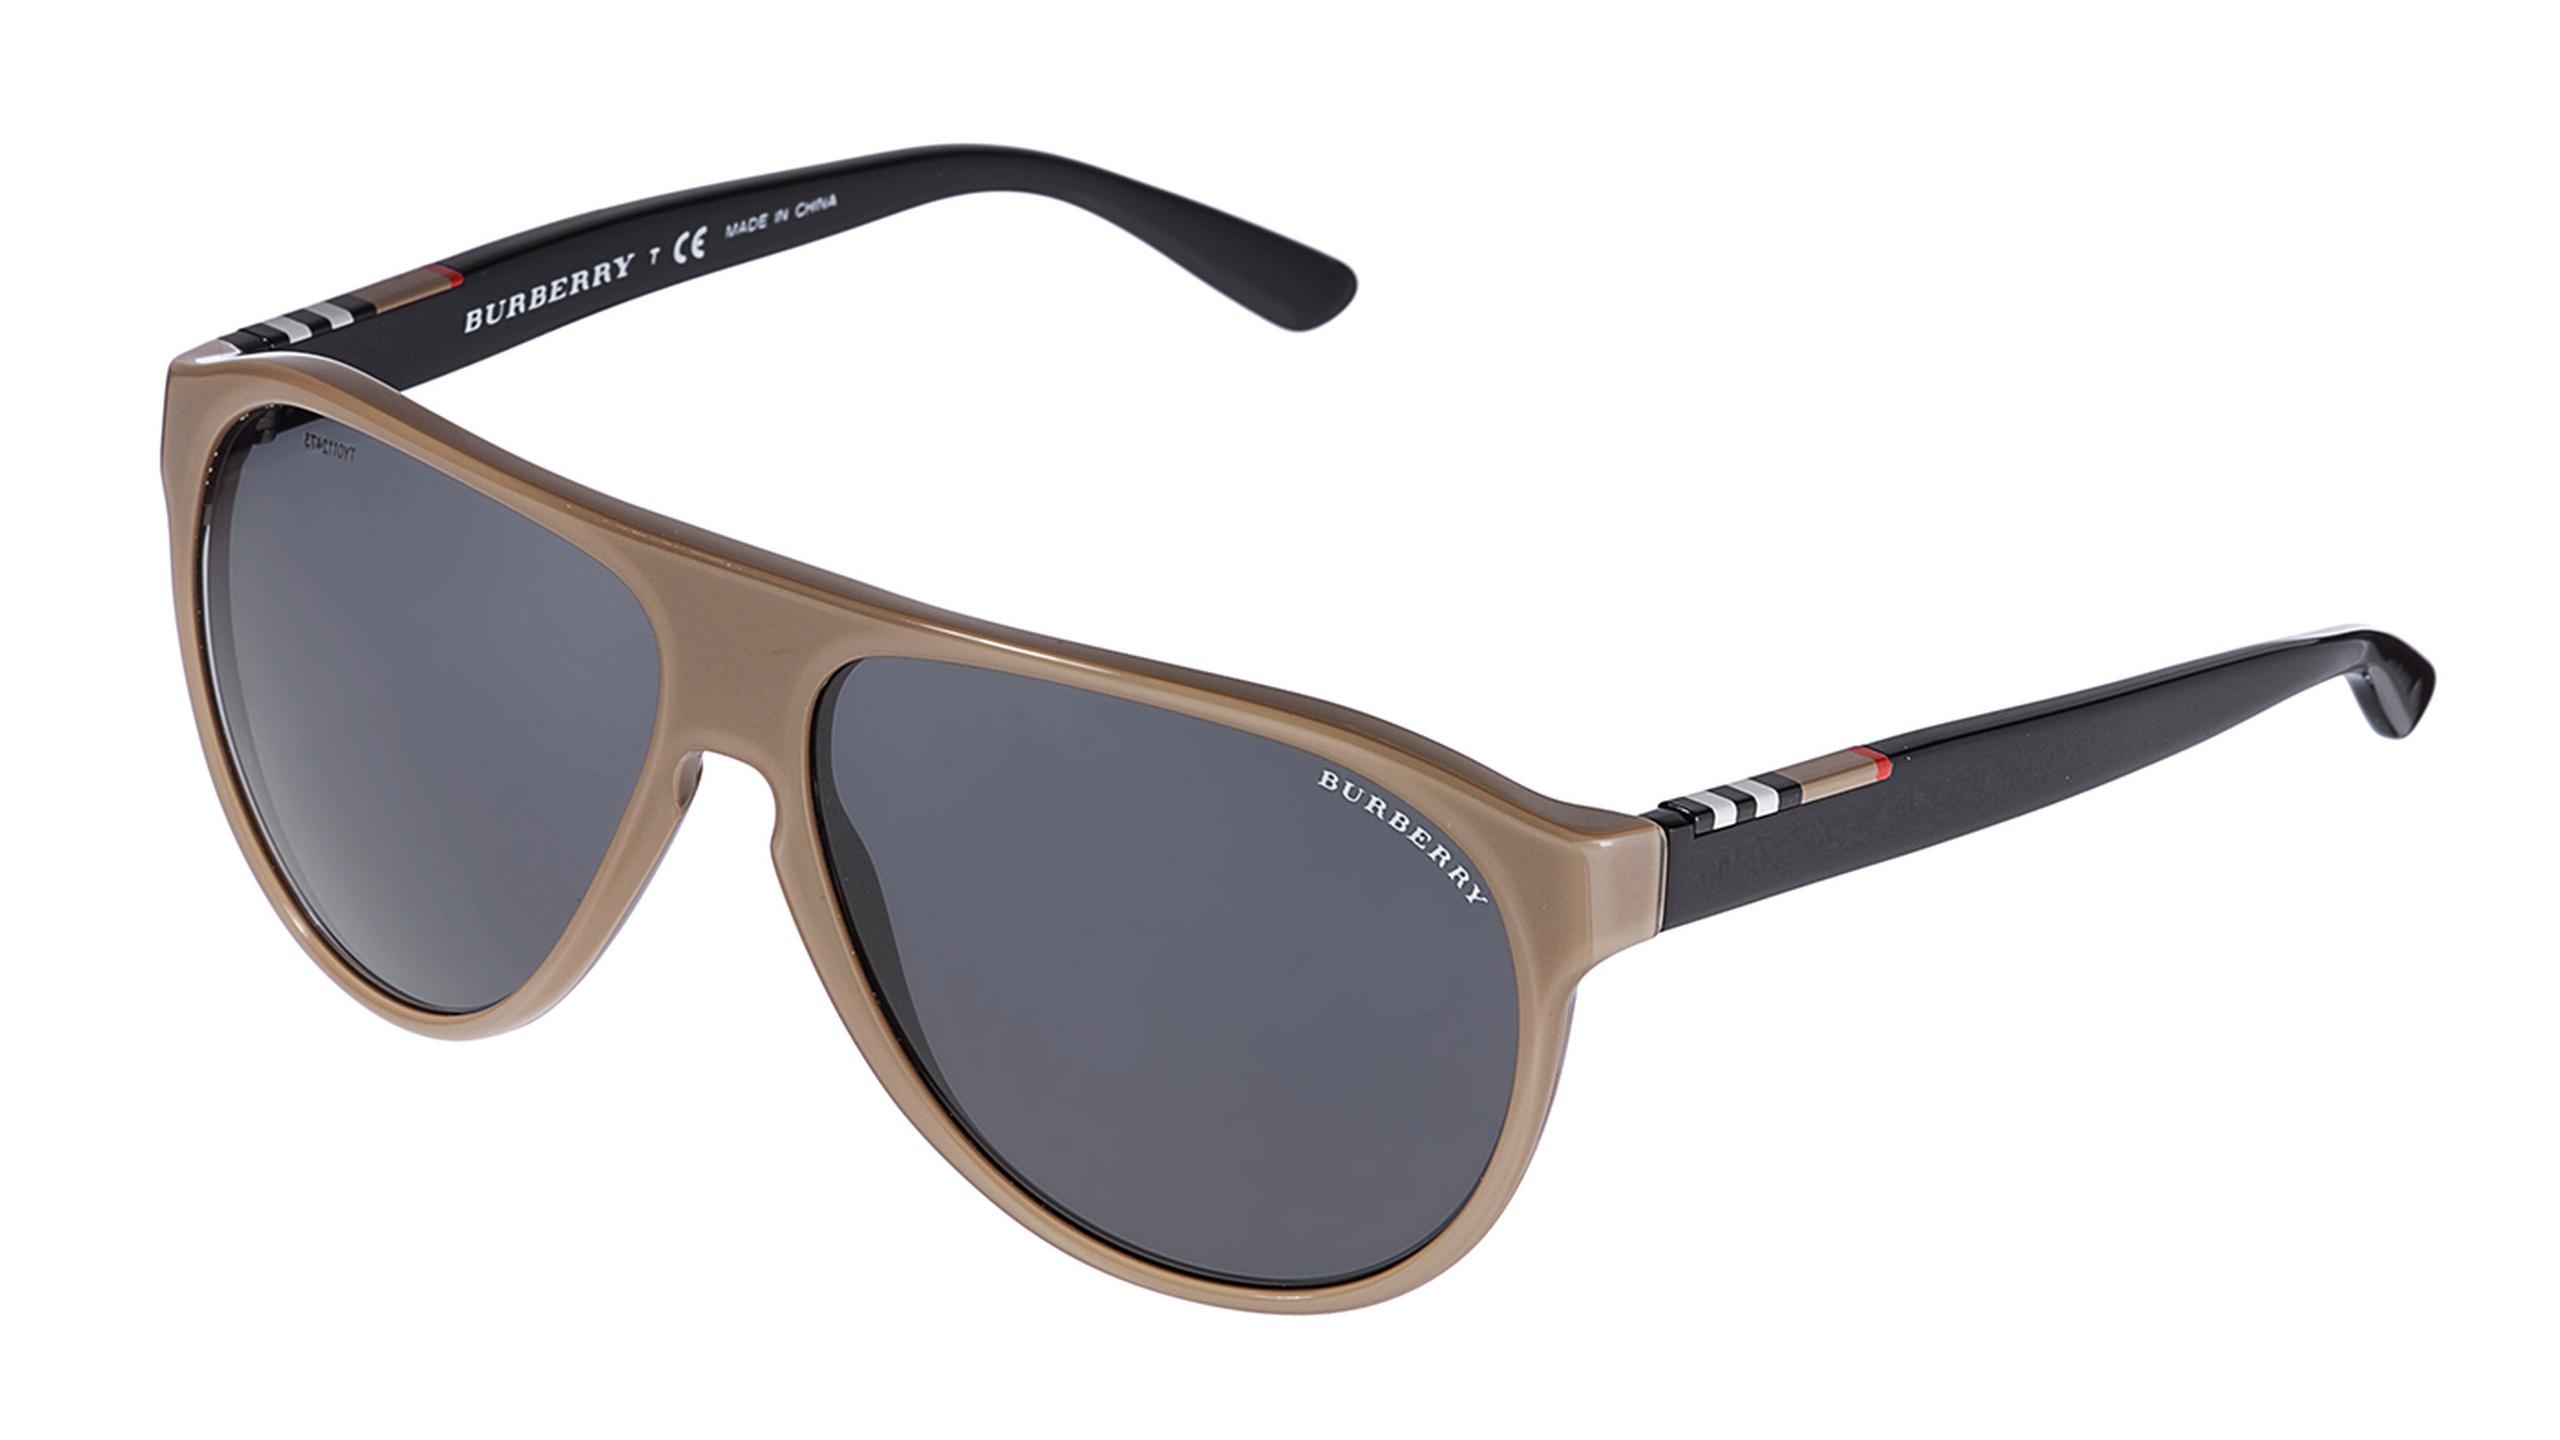 c114eb9ec173 Burberry Women s Sunglasses